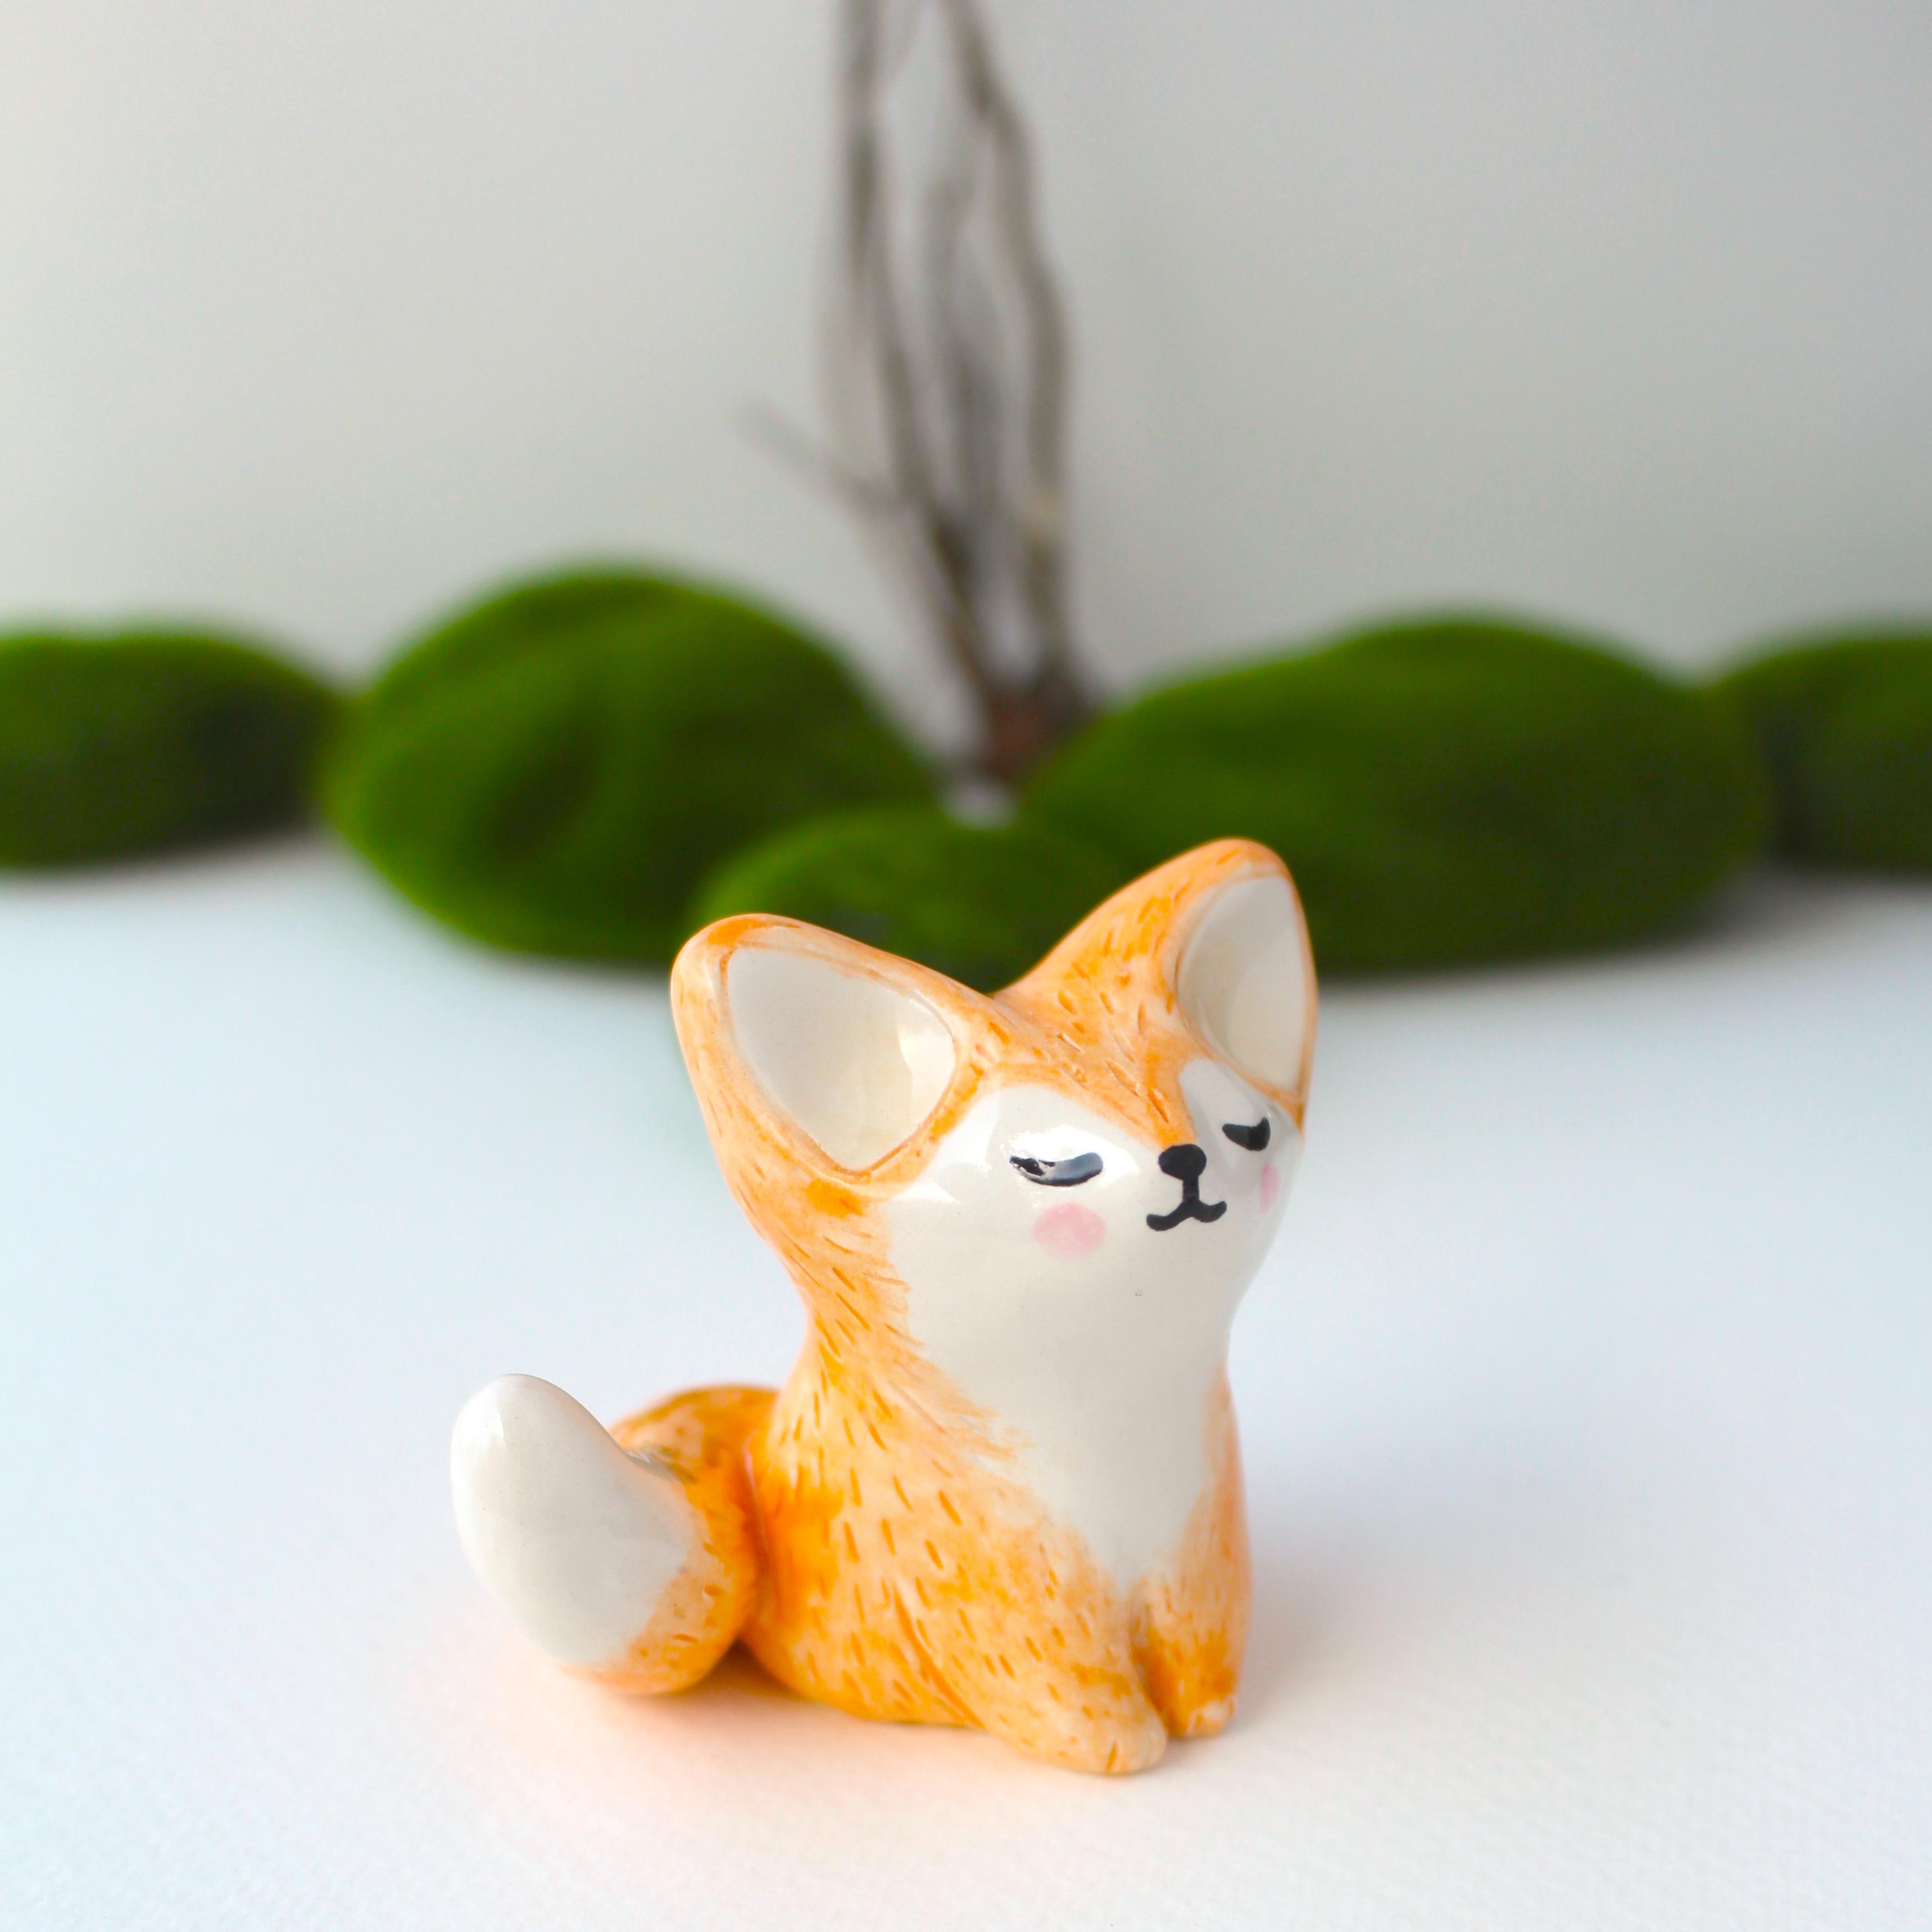 FOX CUB CAKE TOPPER